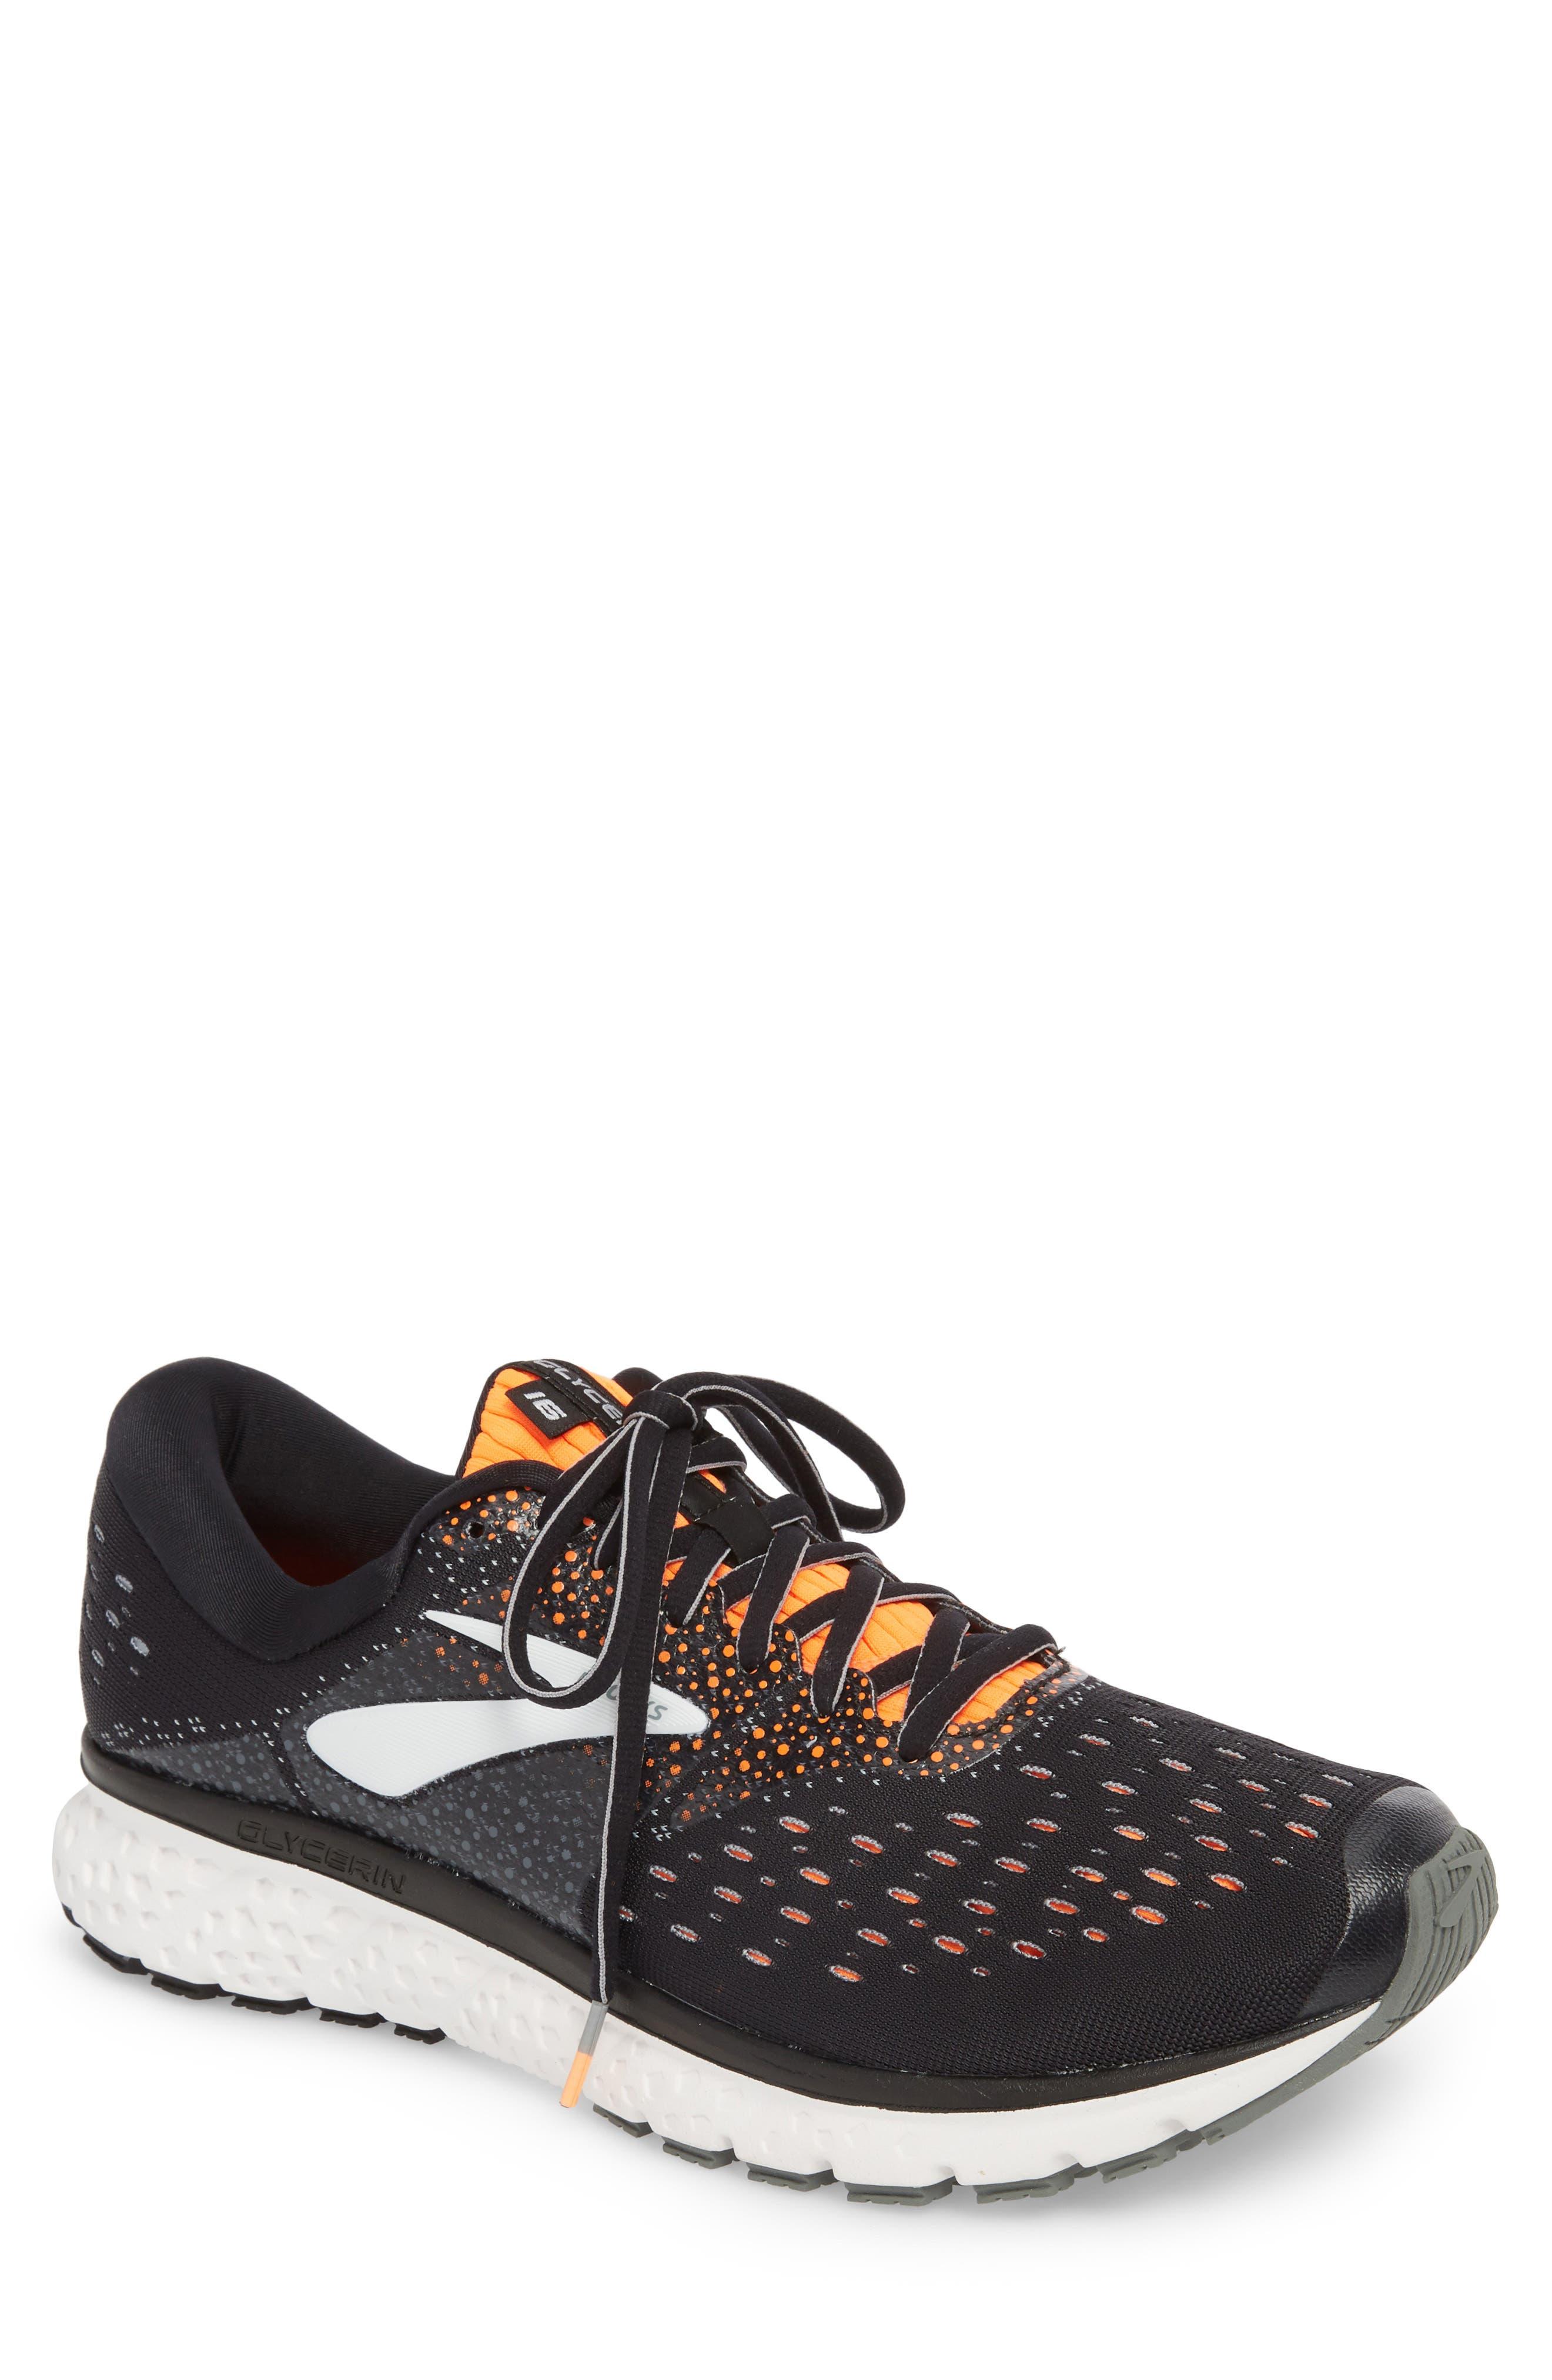 Brooks Glycerin 16 Running Shoe - Black